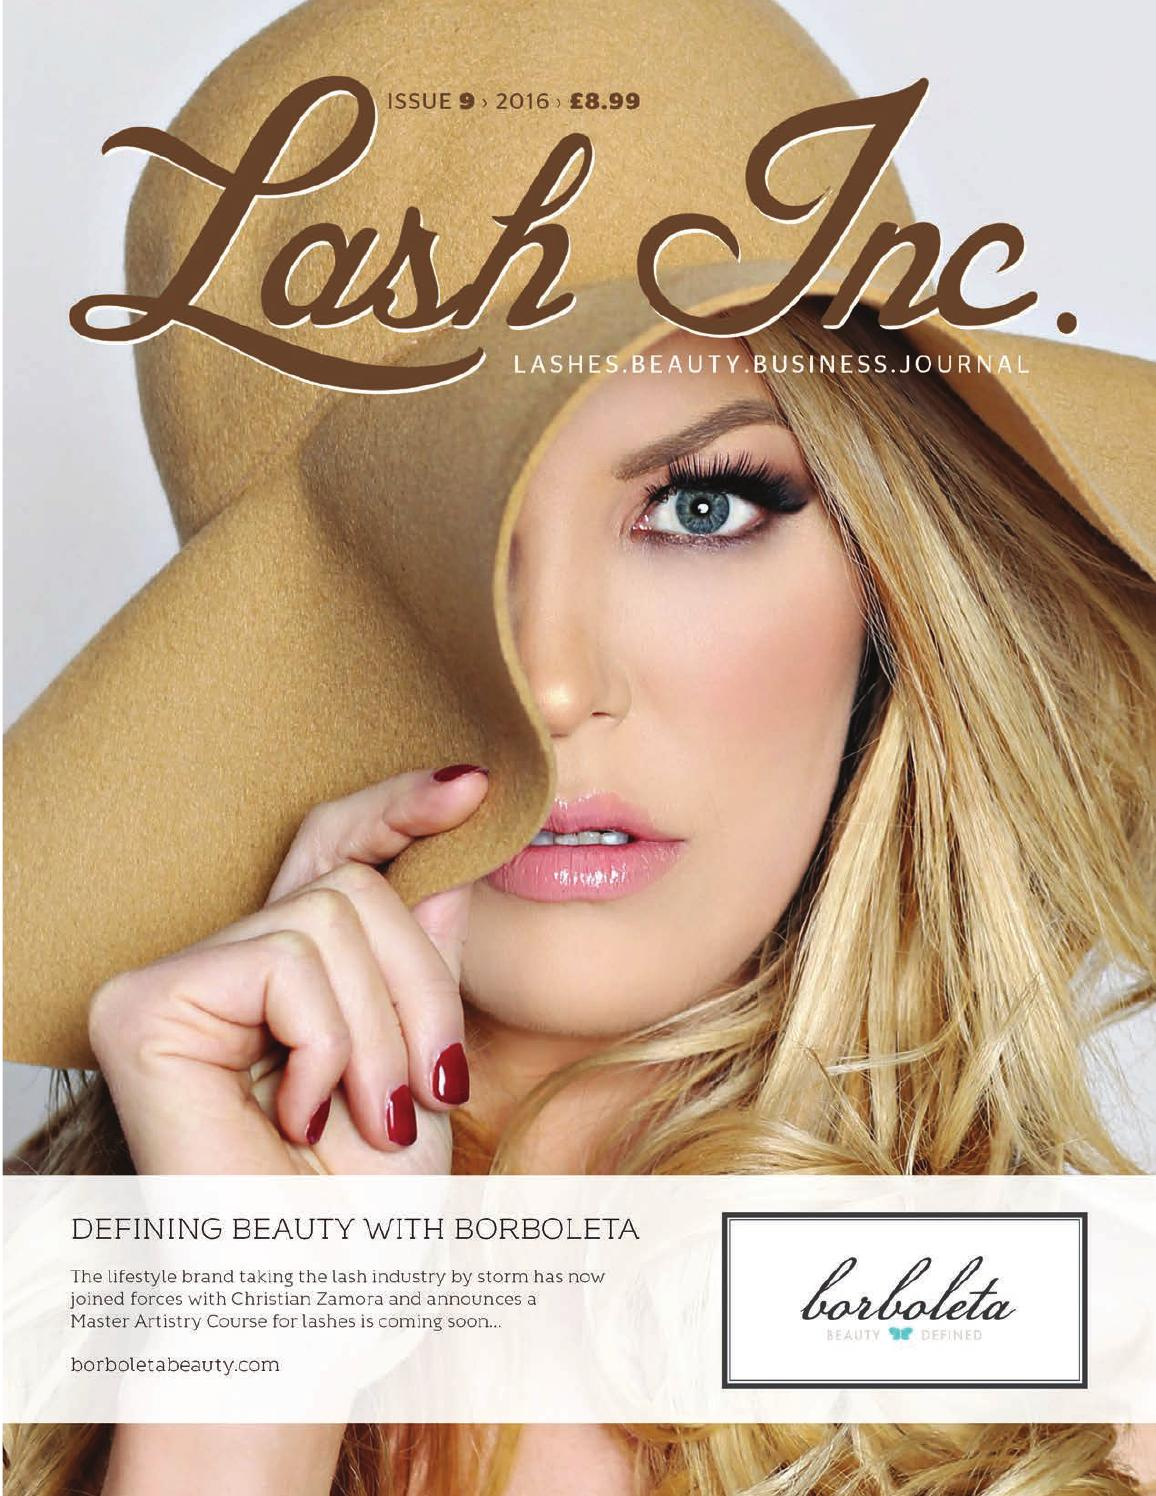 e74cc88f5bd Lash Inc Issue 9 by Chrysalis House Publishing - issuu